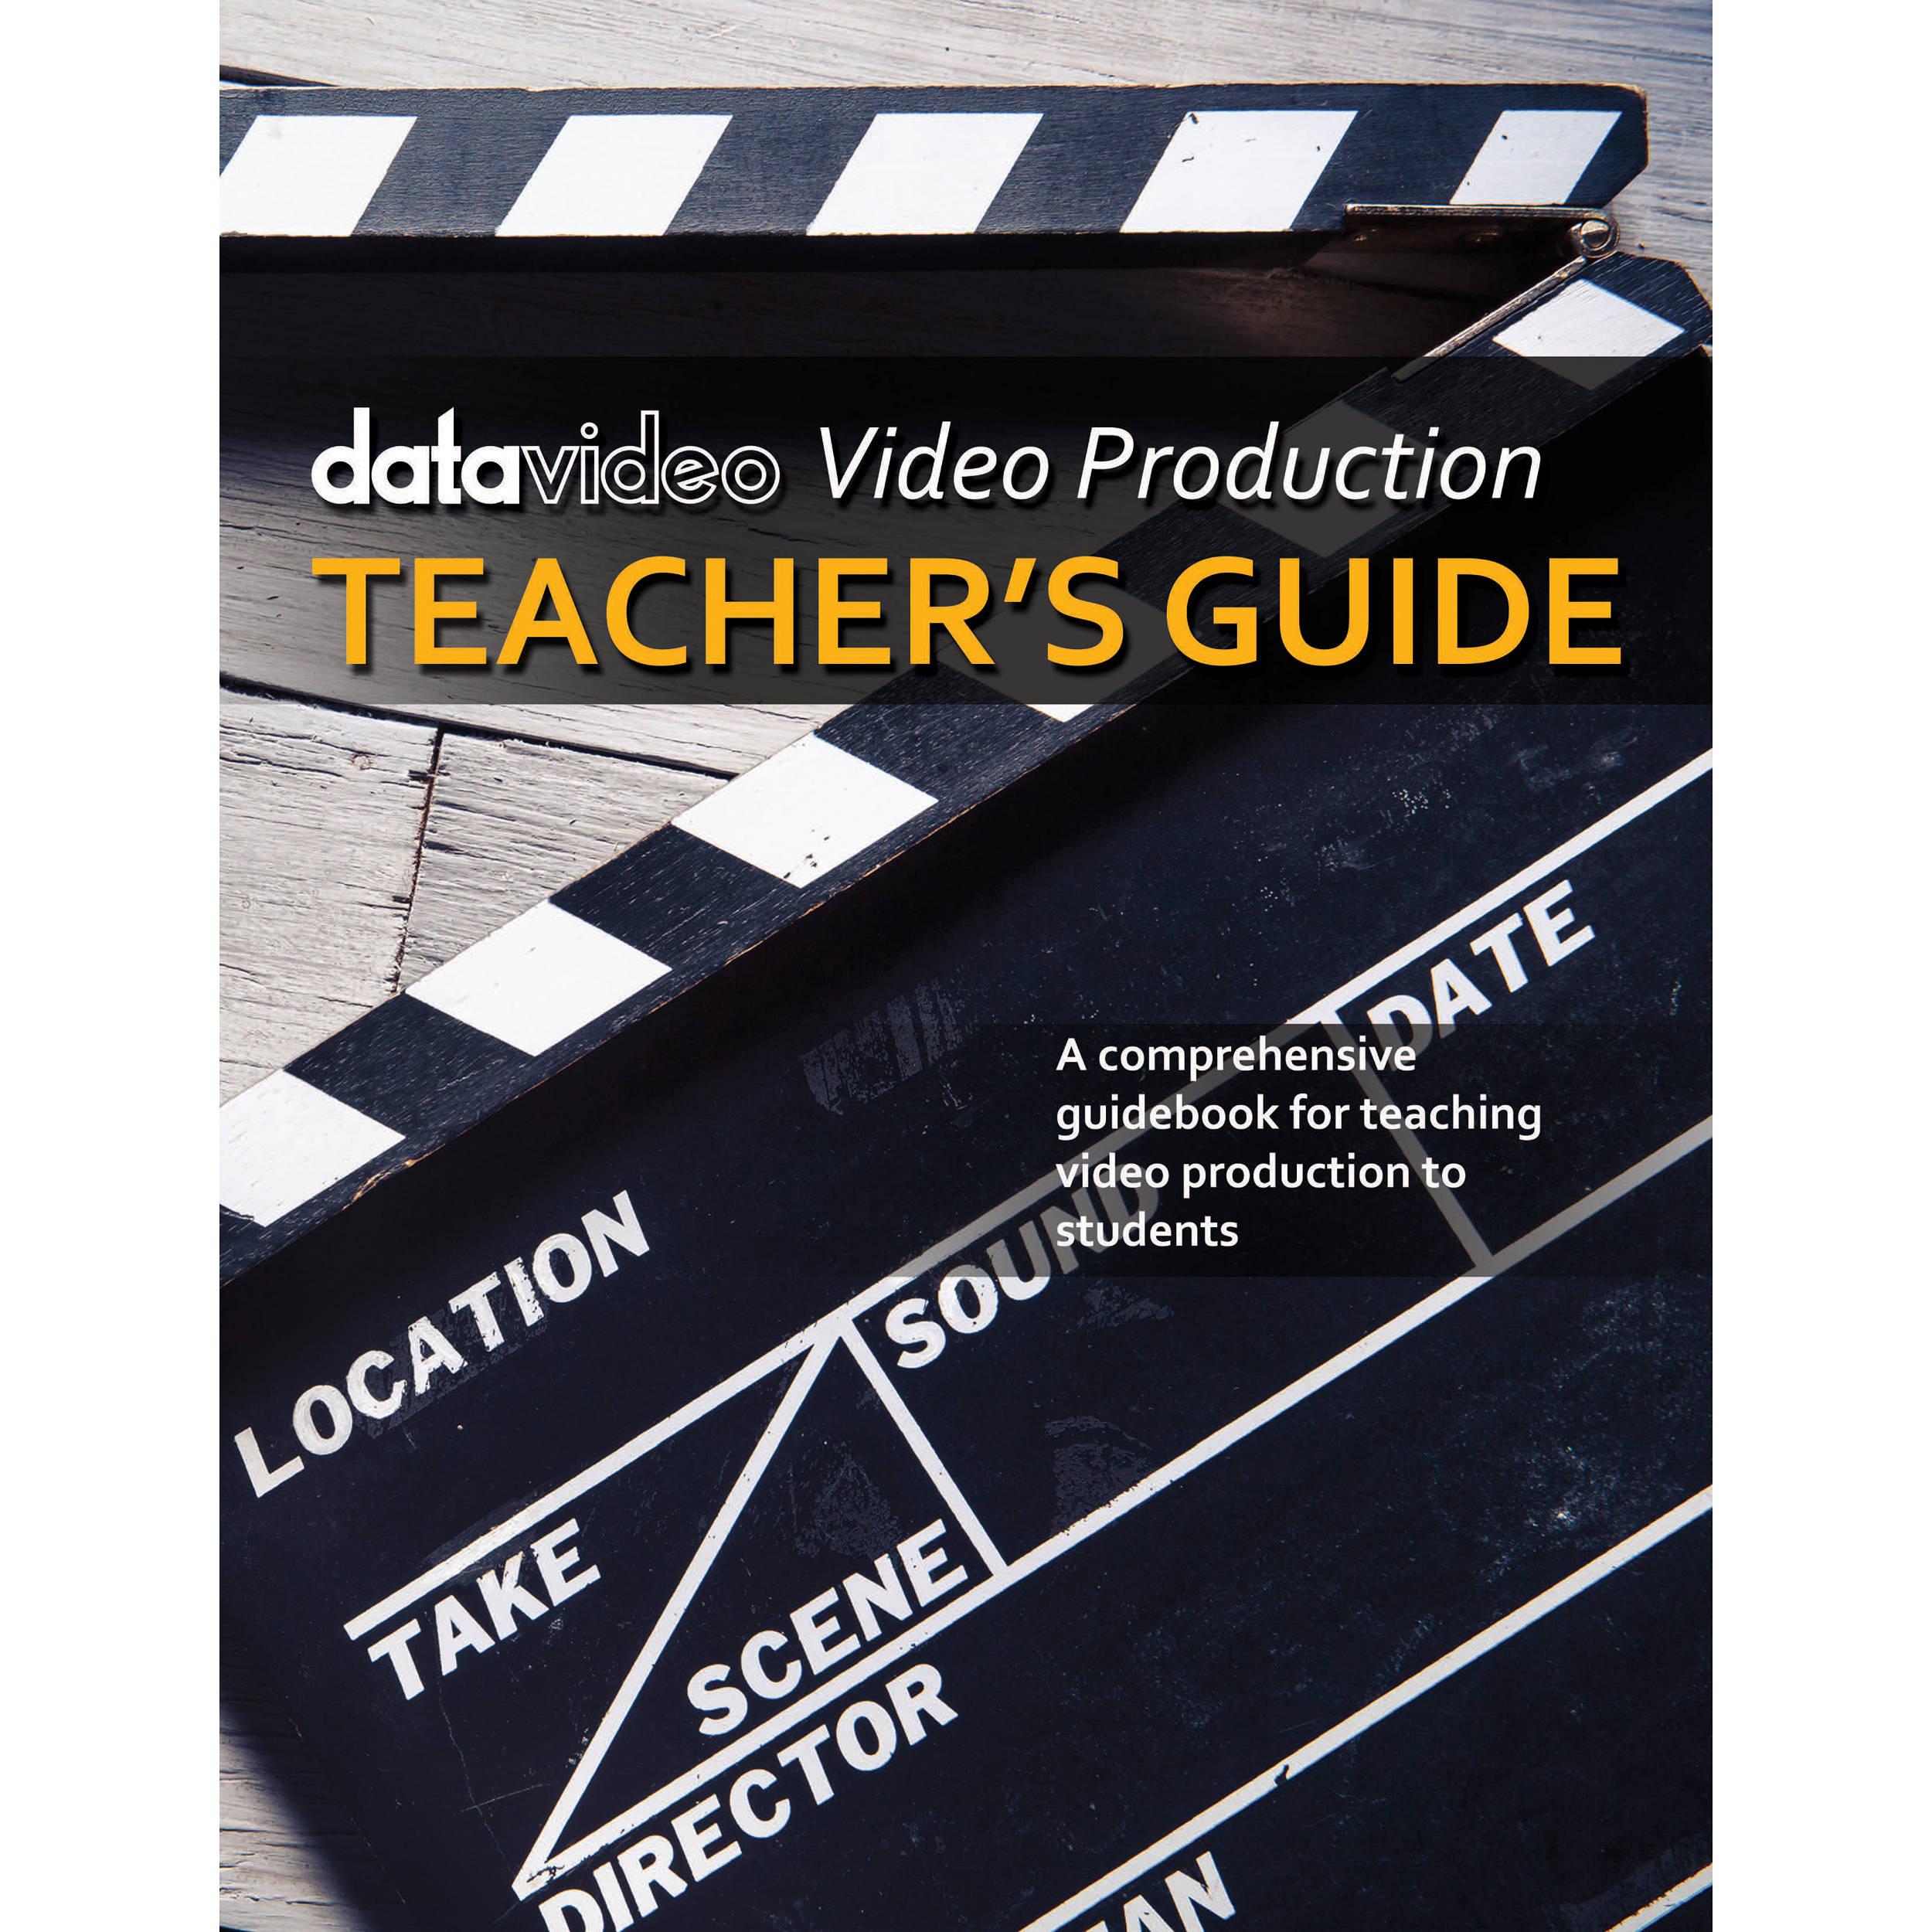 Datavideo Video Production Teacher's Guide